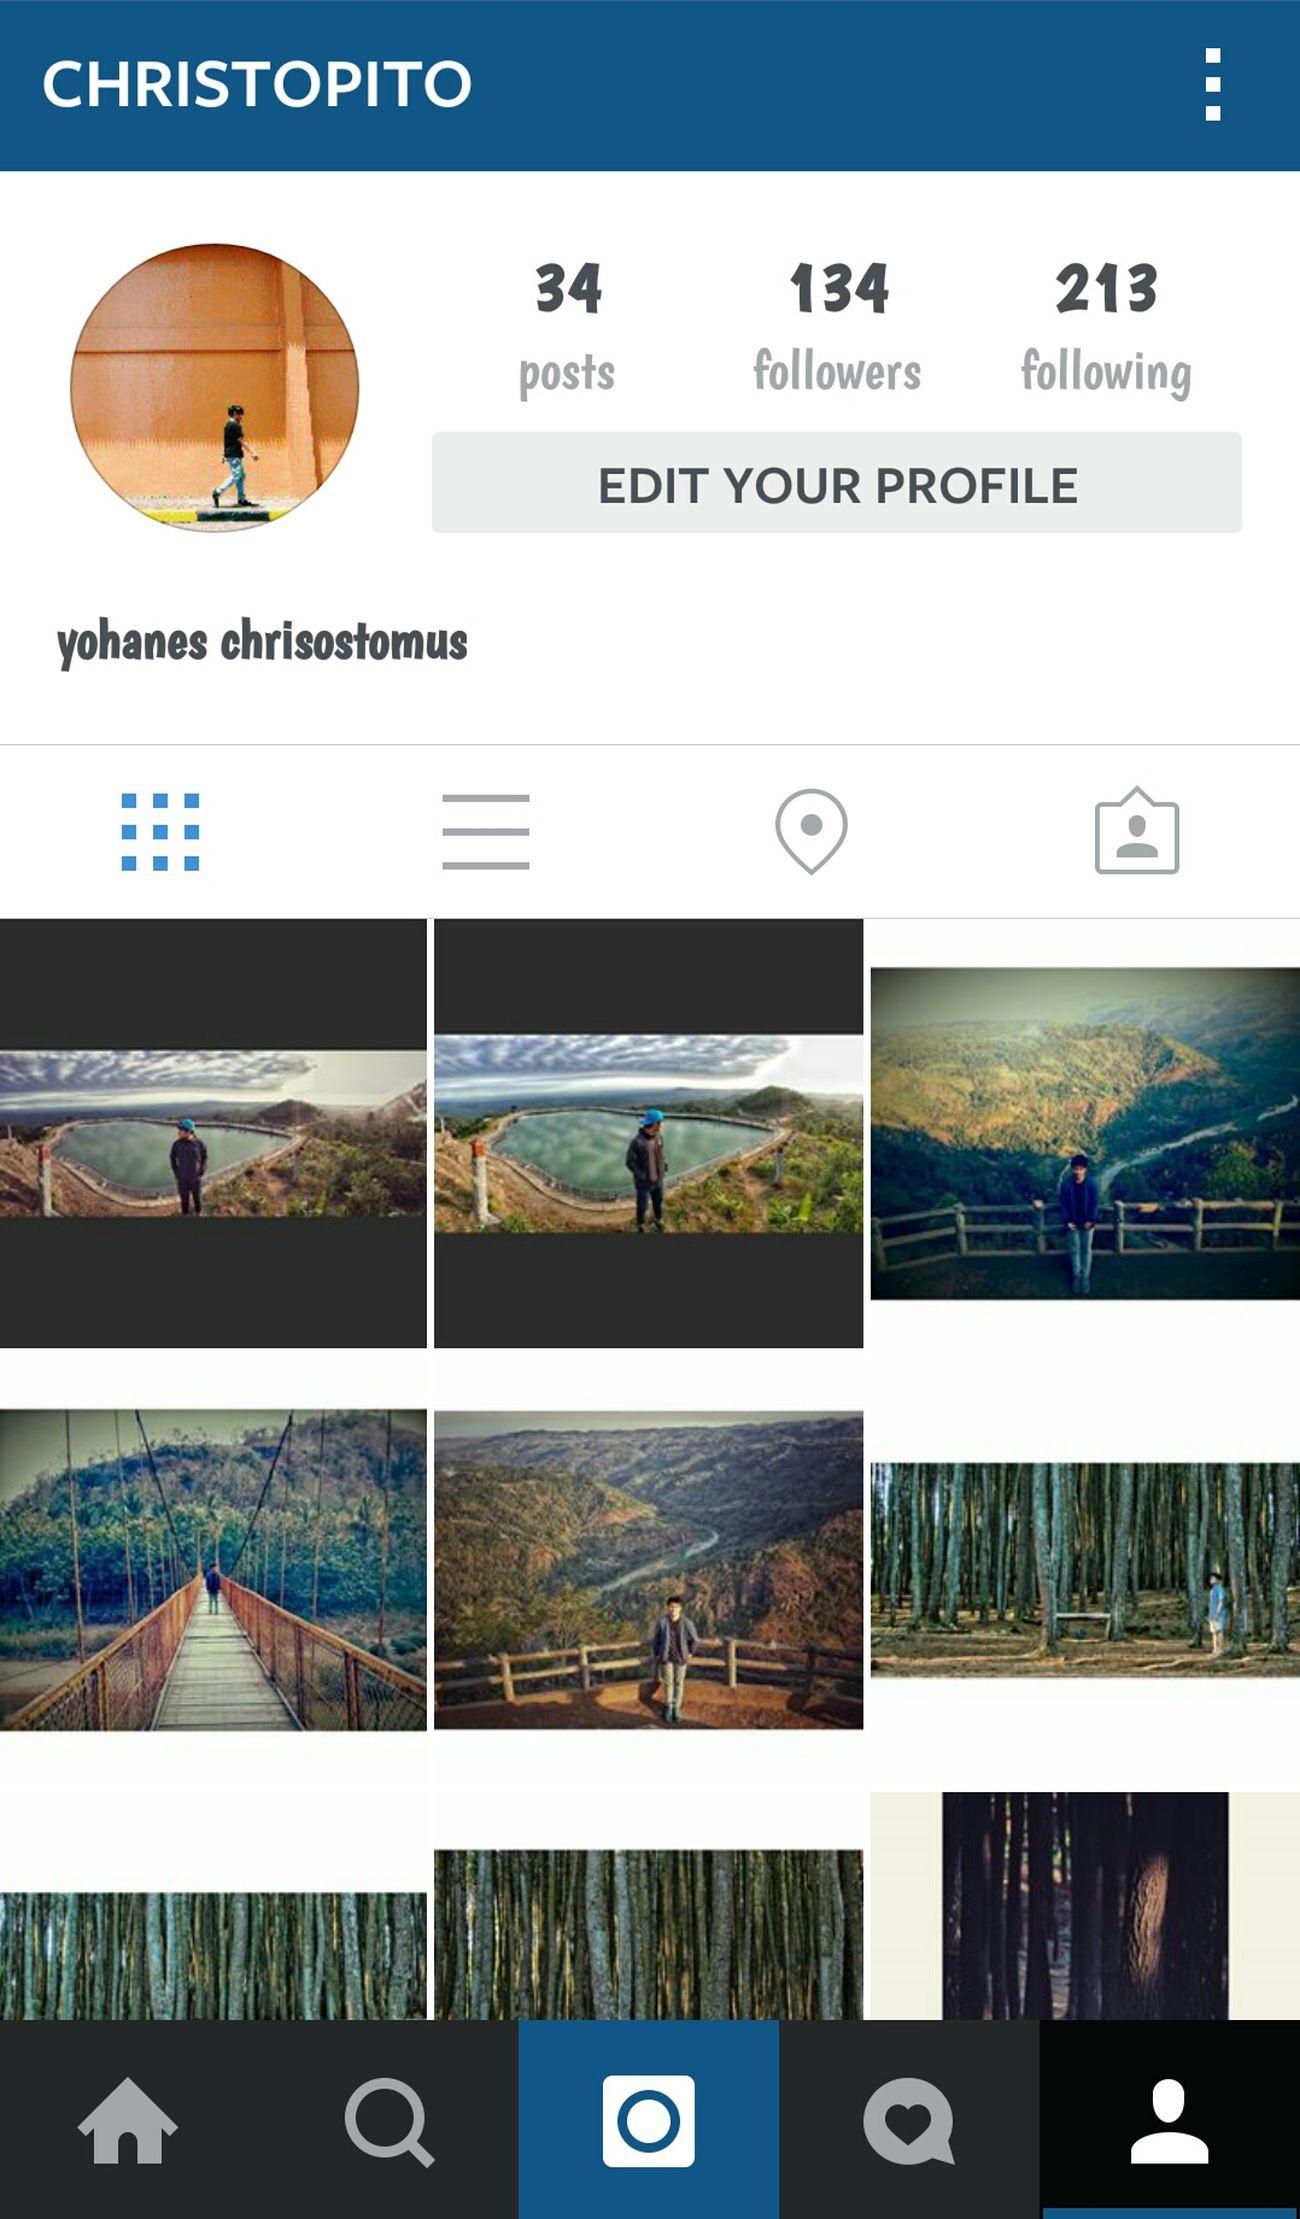 Instagramer Instagramuptown Instagramonly Instagramtags Instagramtagsdotcom Instagramsg Just Share Shareforshare EyeEm Indonesia Eyeemlike